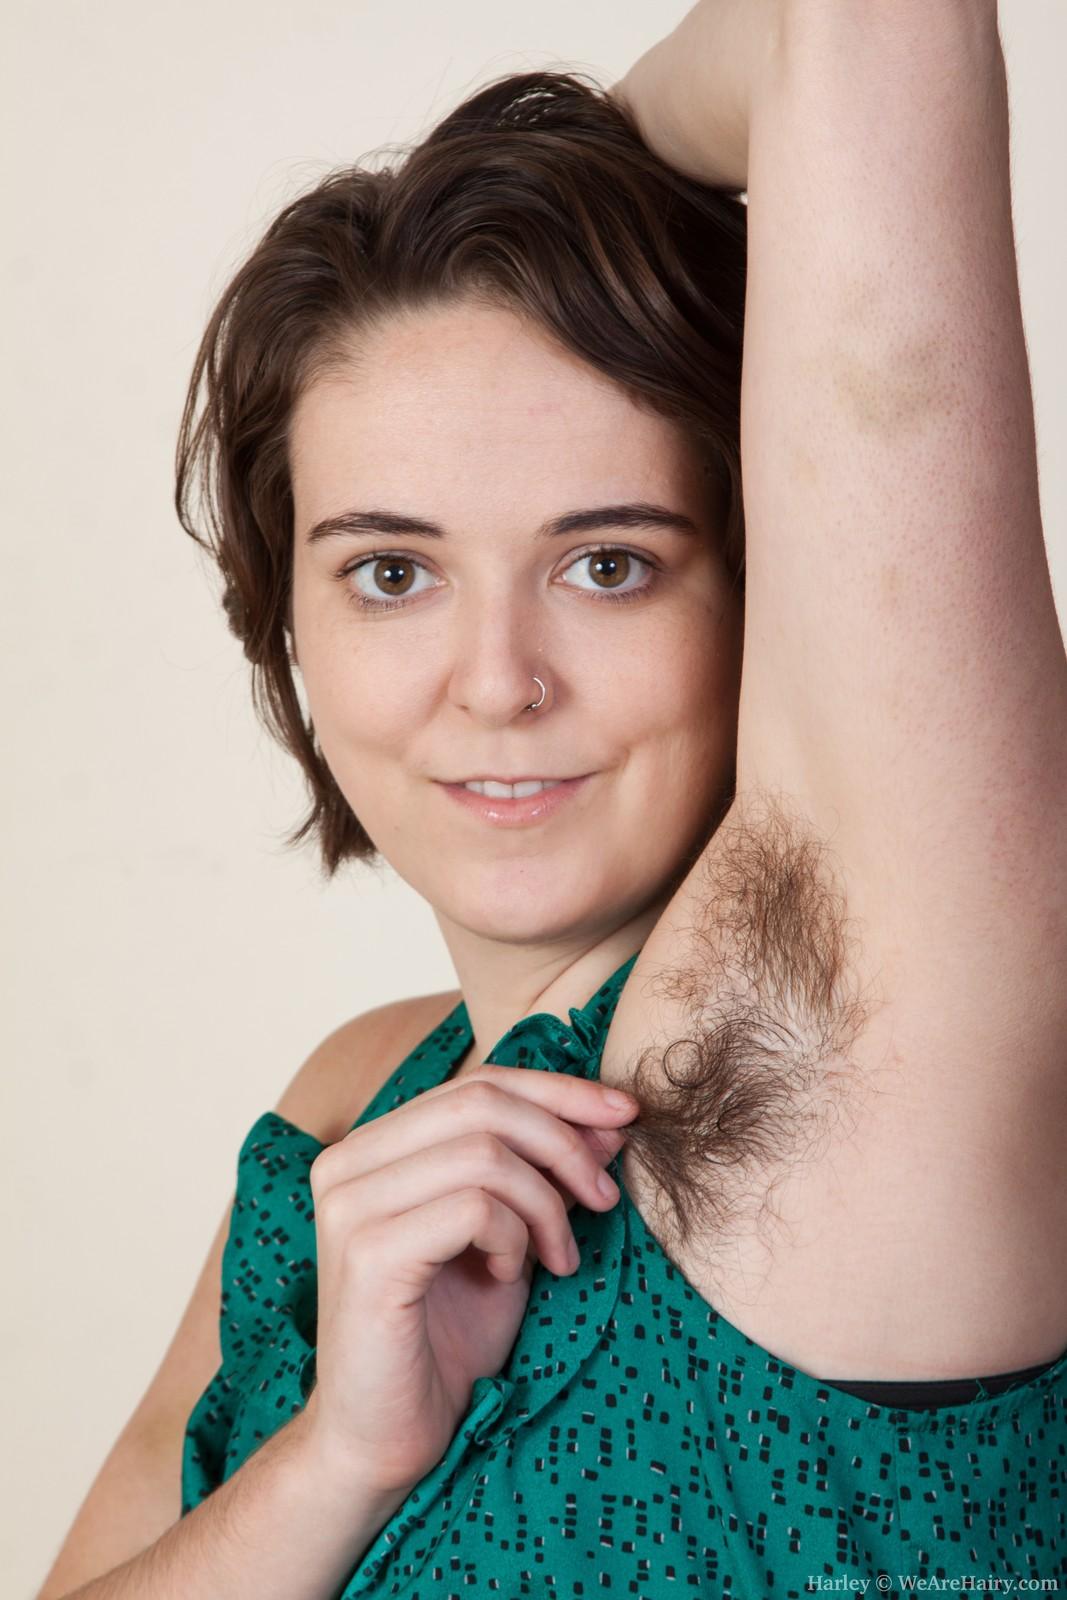 women pussy hairy nude Beautiful